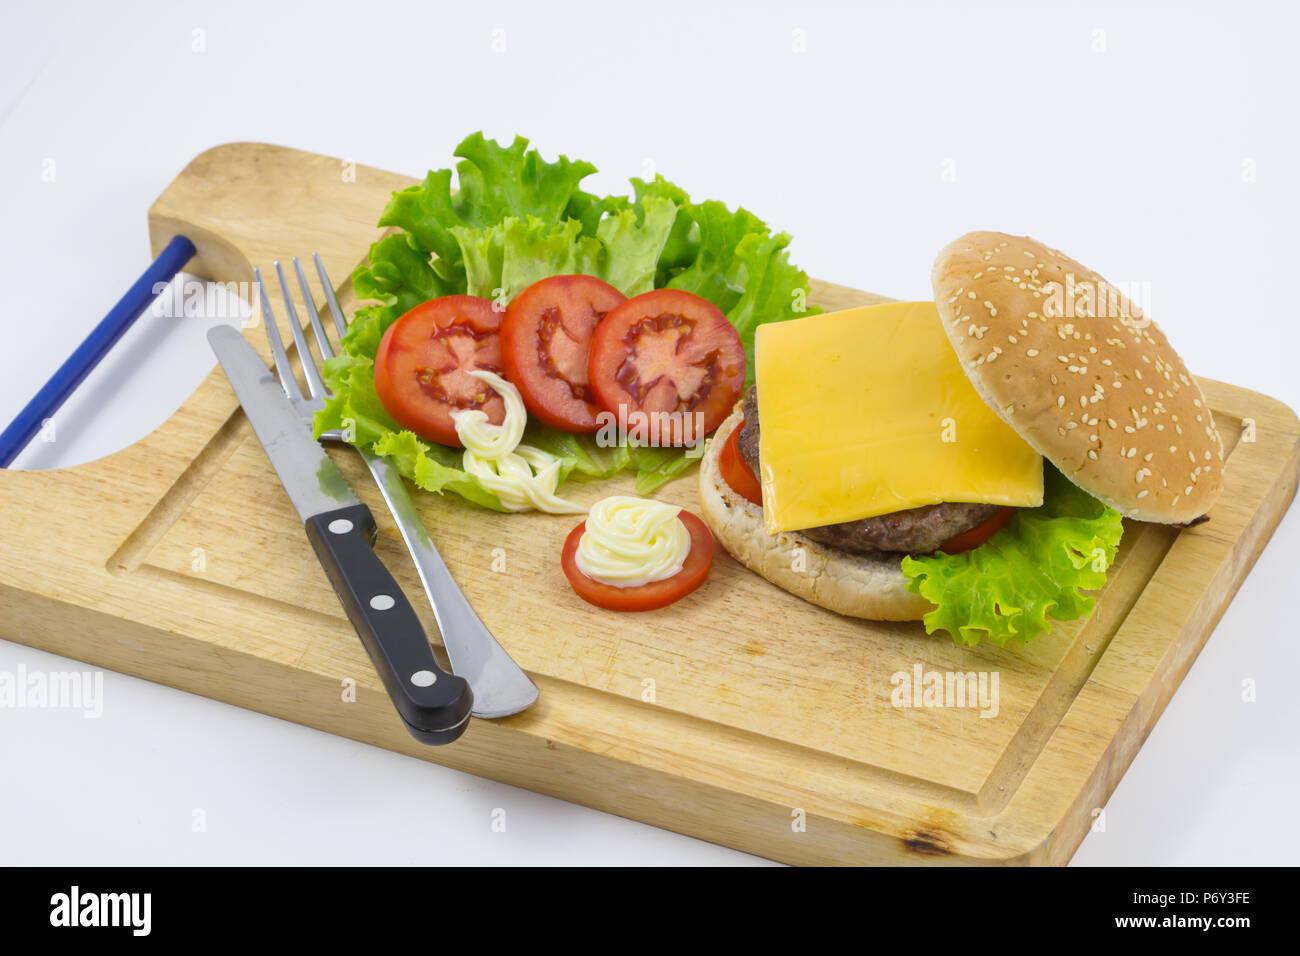 Hamburguesa casera con lechuga, tomate, queso, carne de res y papas fritas colocadas sobre fondo de madera , frescos sabrosas hamburguesas, de fondo Foto de stock